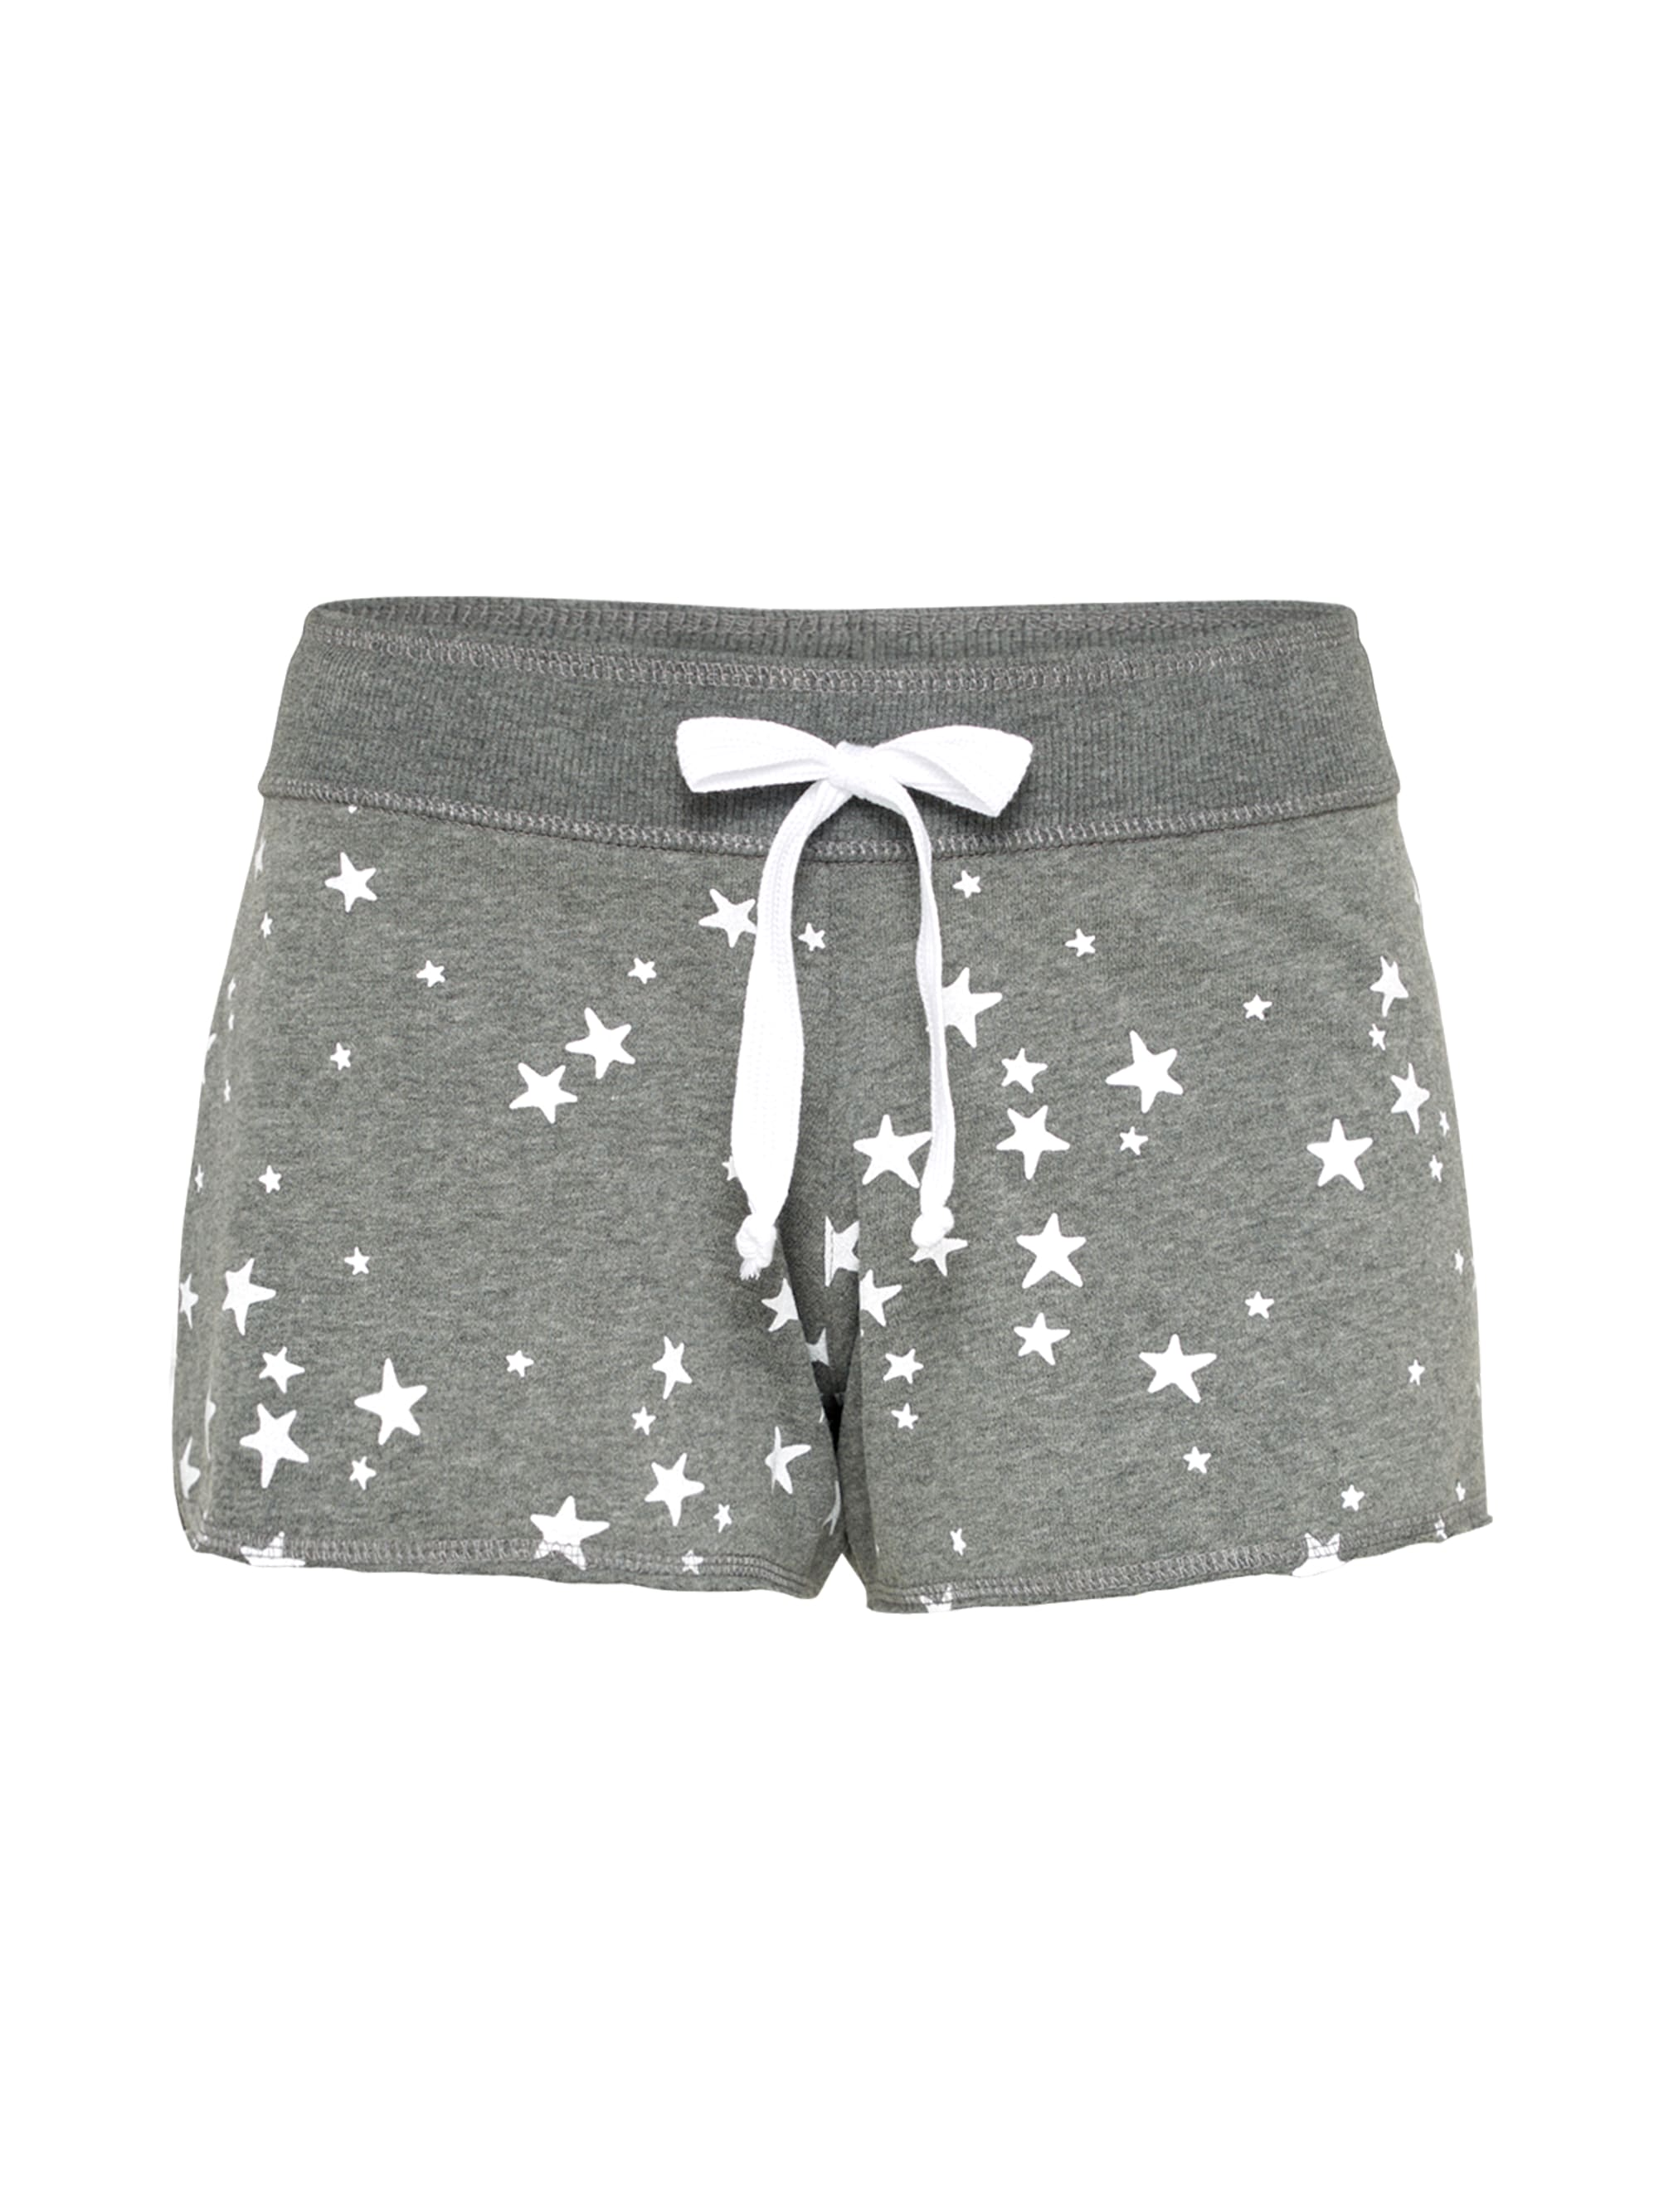 Sternchen Shorts